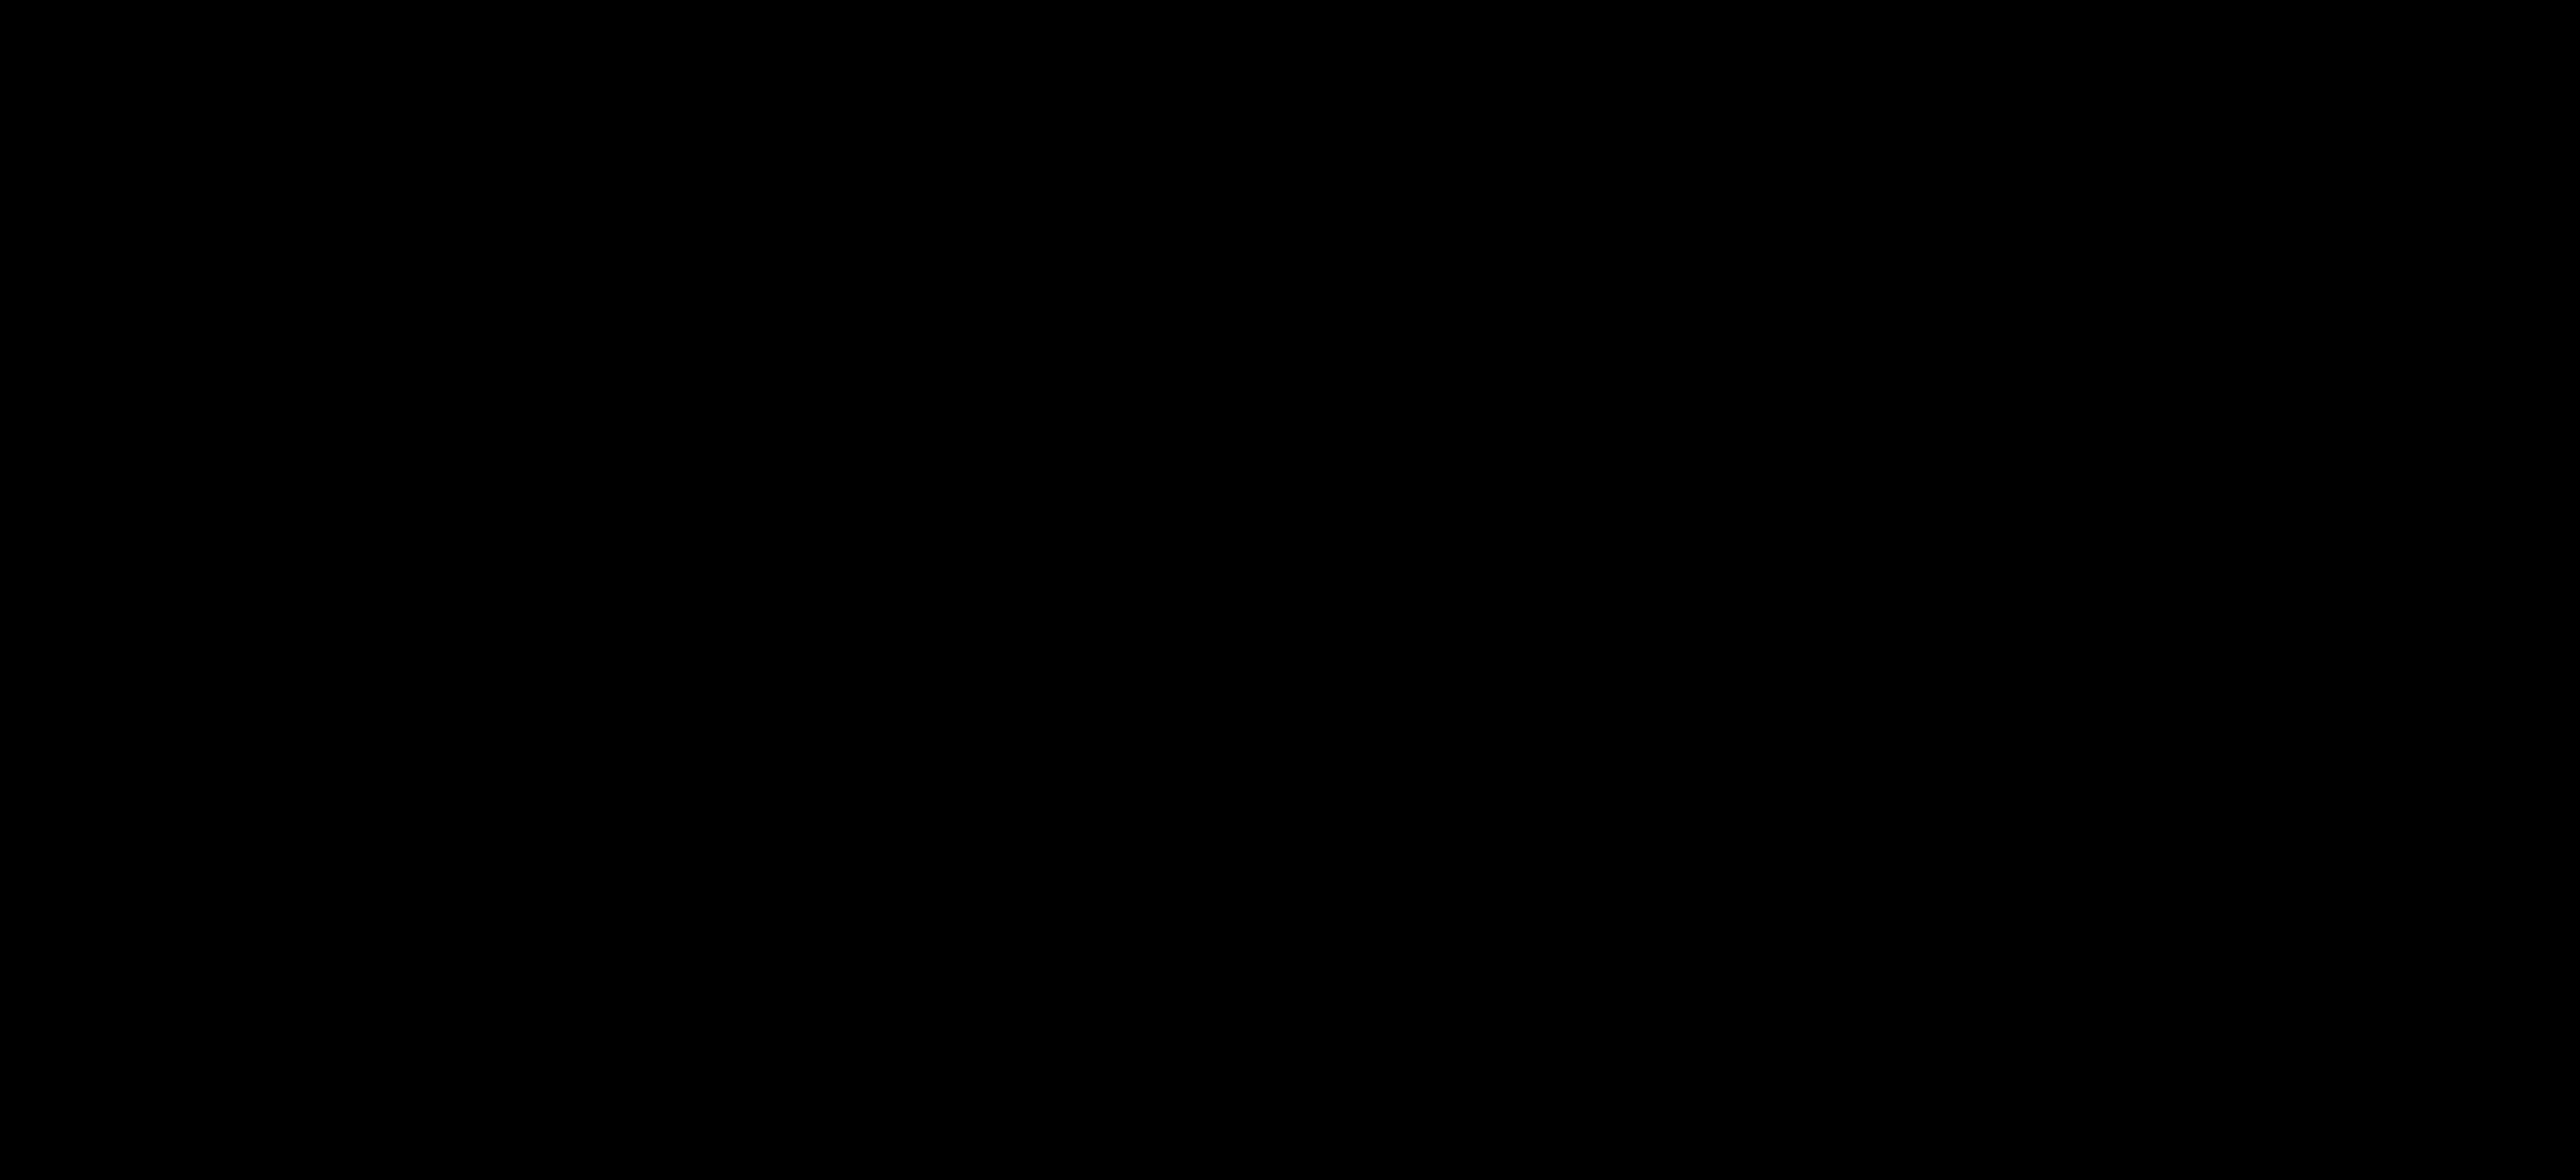 2-[N<sub>2</sub>-(N<sub>6</sub>-t-Boc-6-aminocaproyl)-N<sub>6</sub>-(6-biotinamidocaproy)-L -lysinylamido]ethyl Methanethiosulfonate